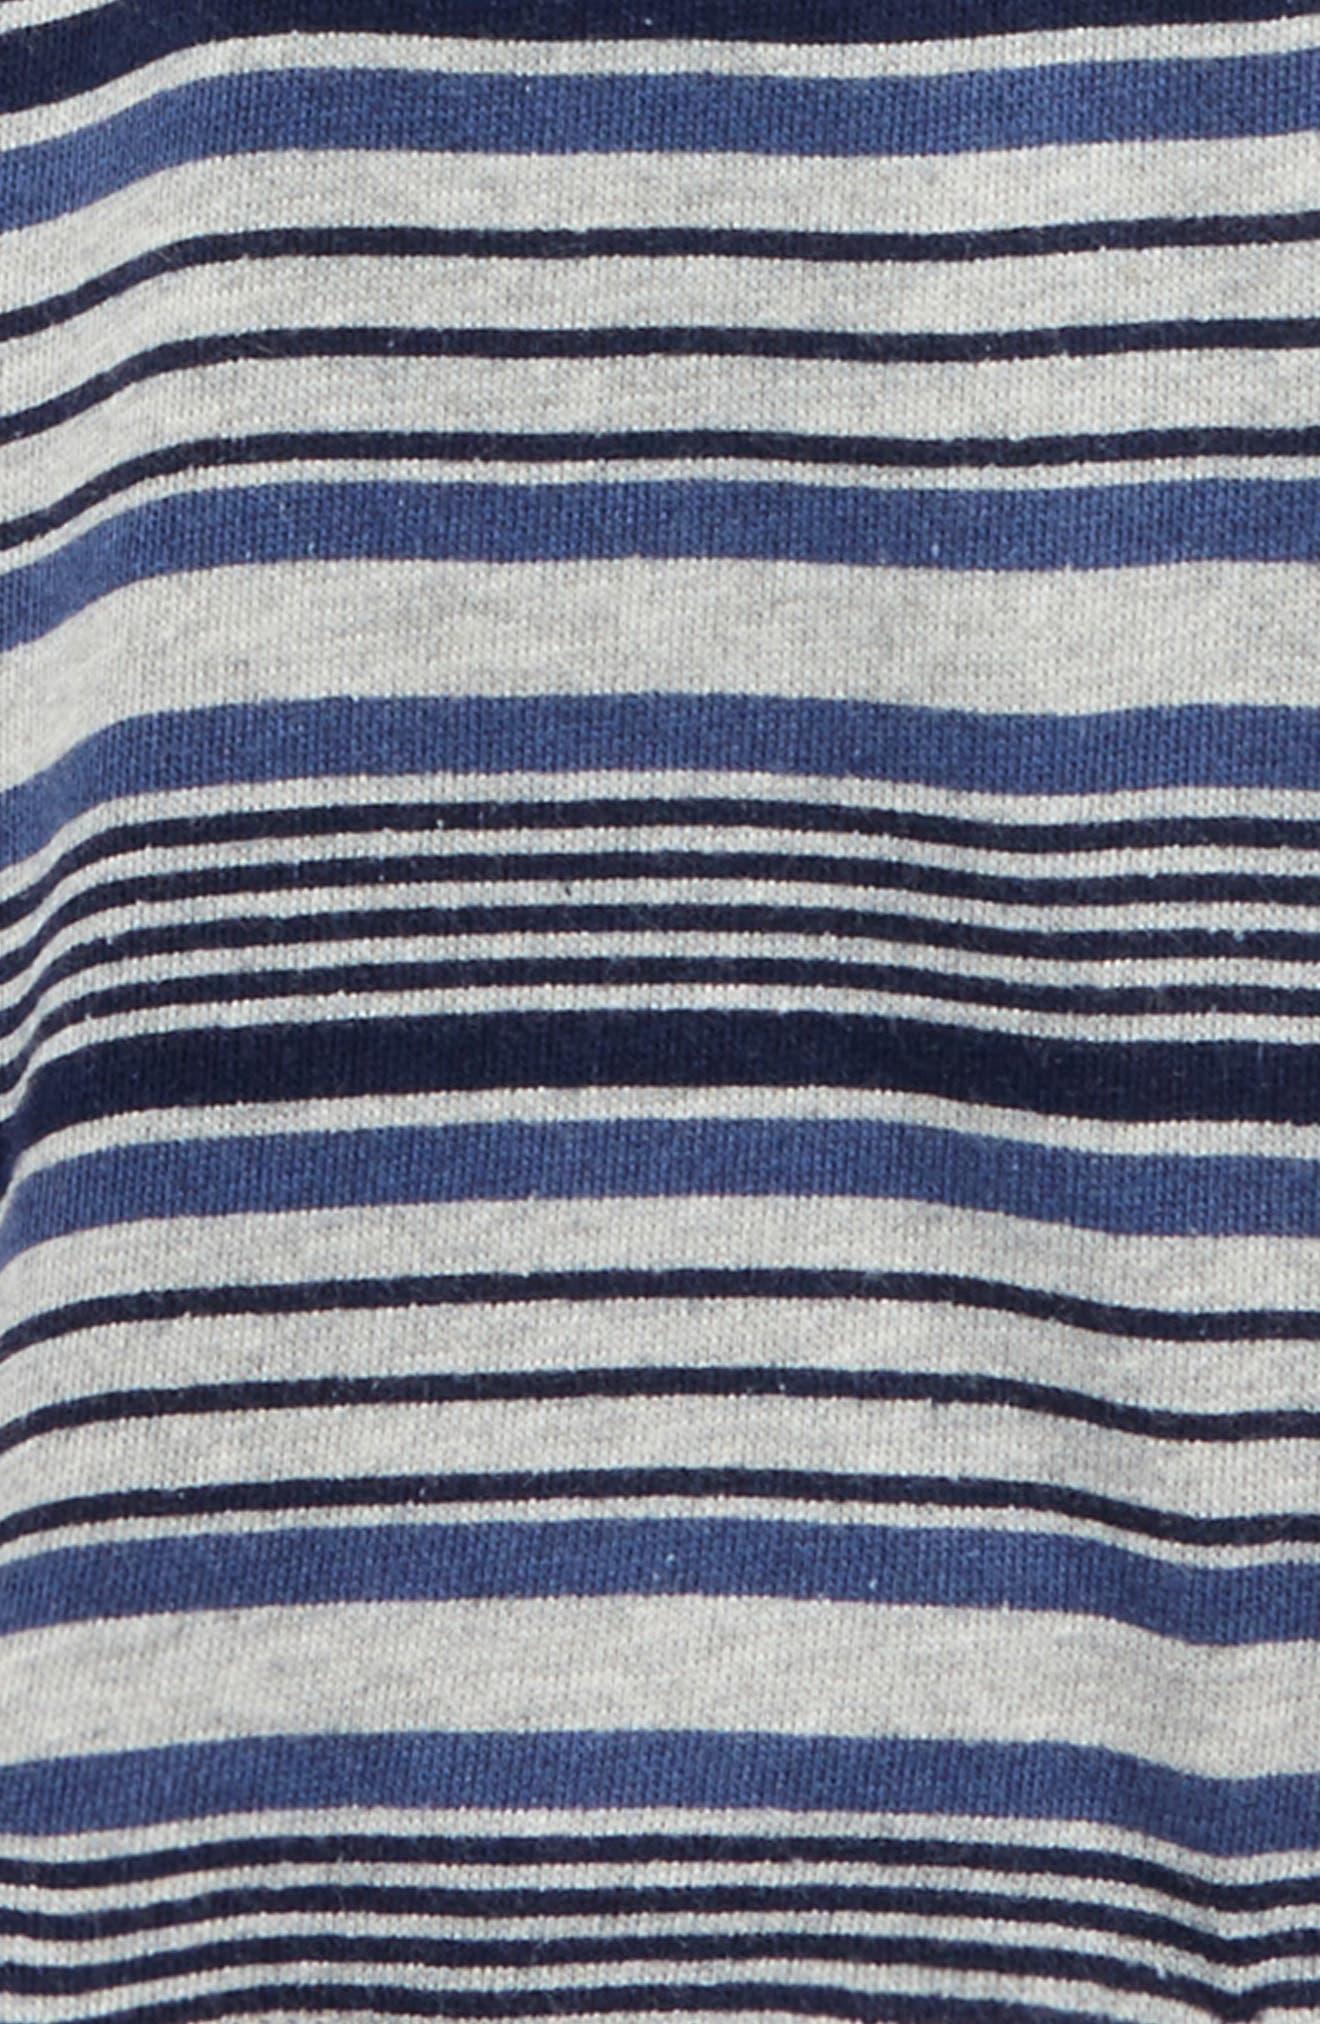 Henley Shirt & Knit Shorts Set,                             Alternate thumbnail 2, color,                             420